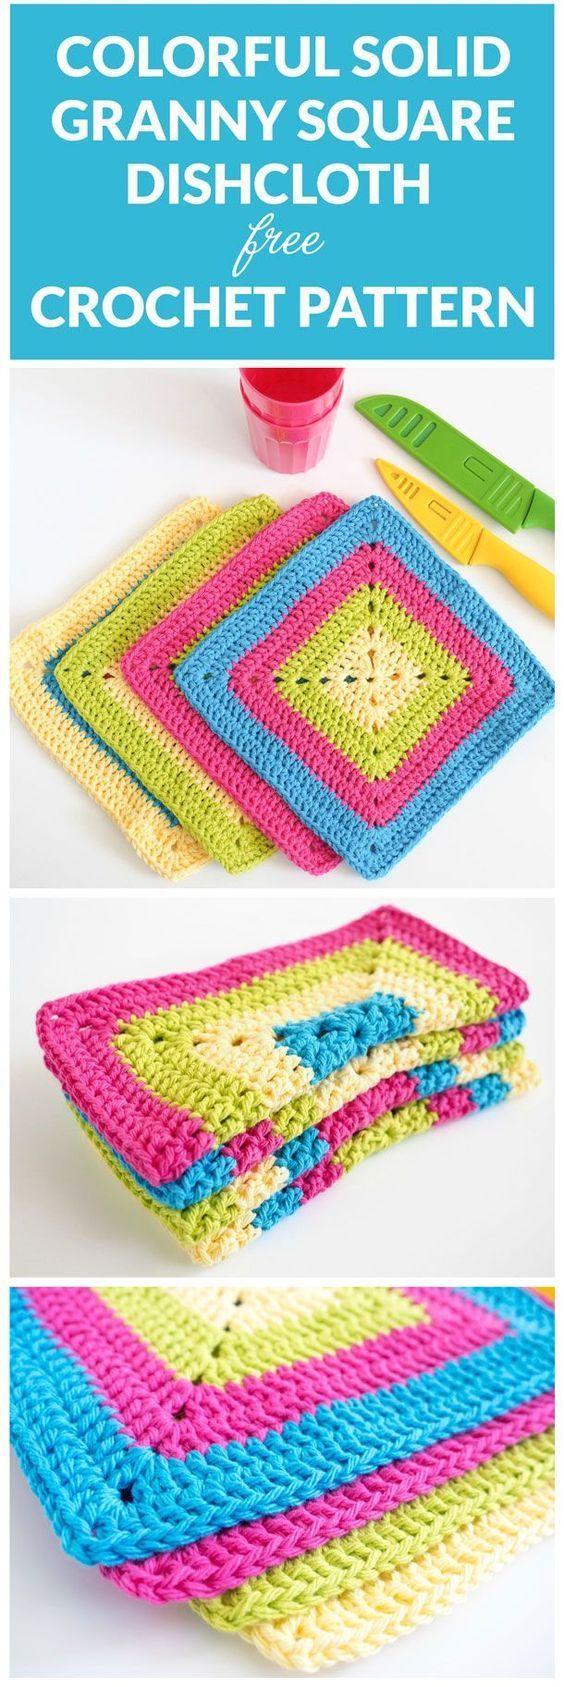 Colorful Solid Granny Square Dishcloth Crochet Pattern   Pinterest